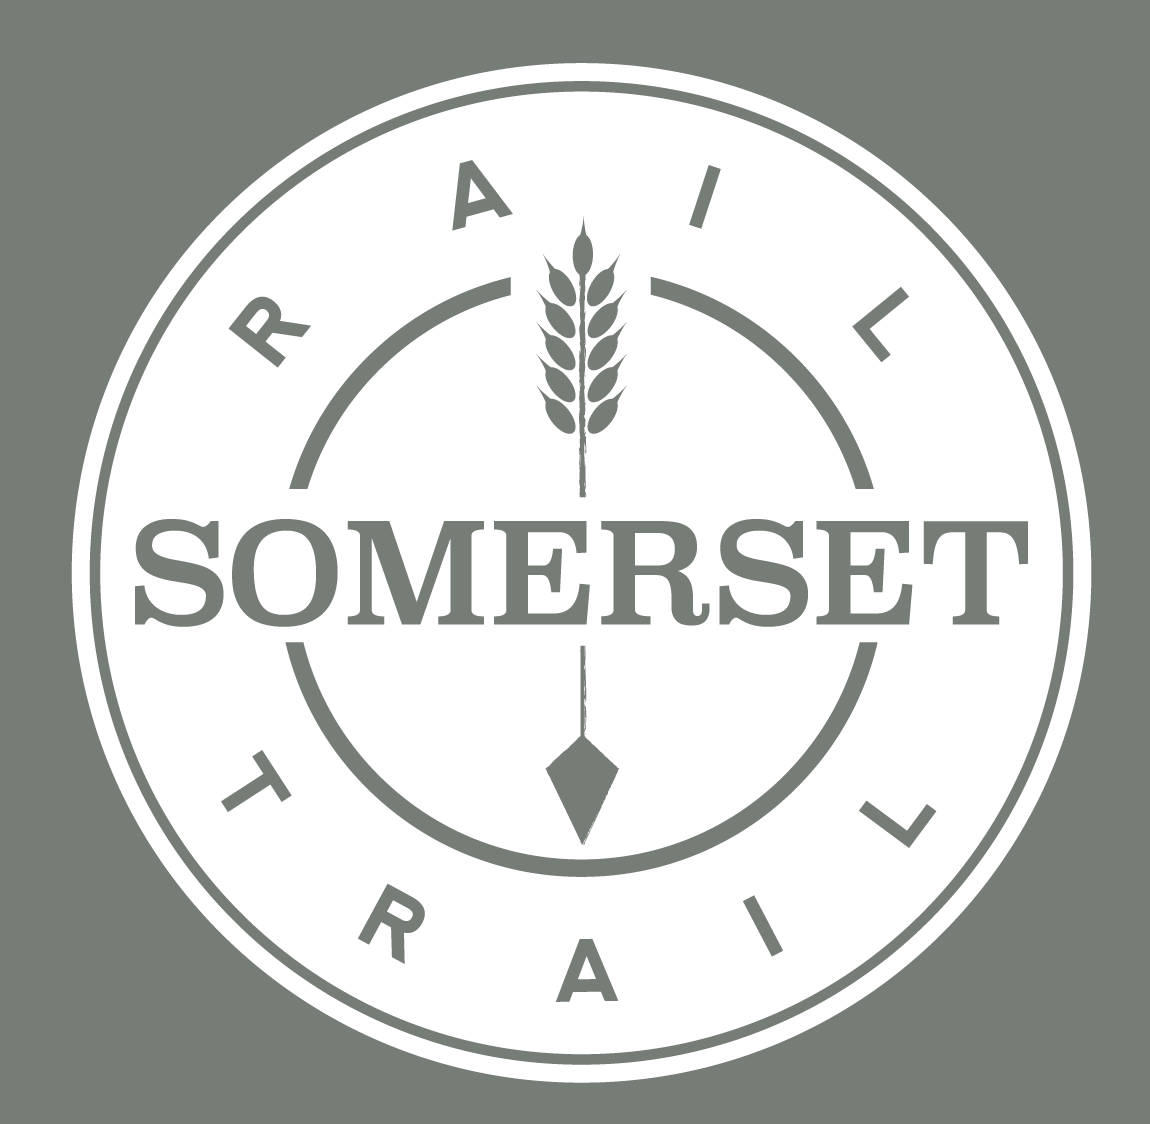 railtotrail